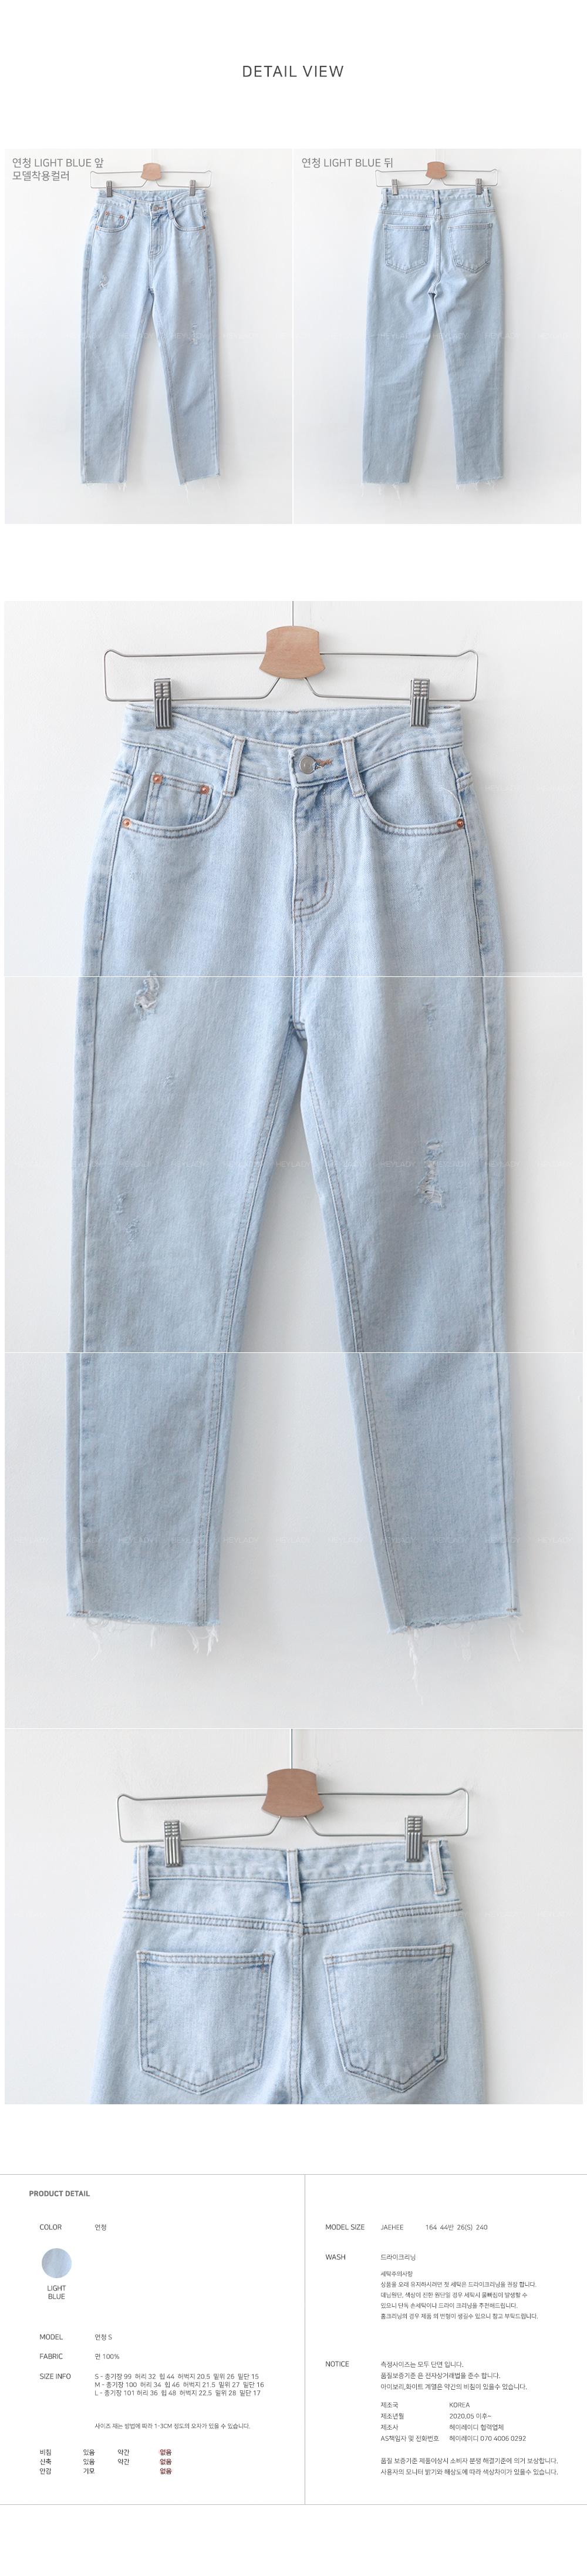 Boarding date denim pants